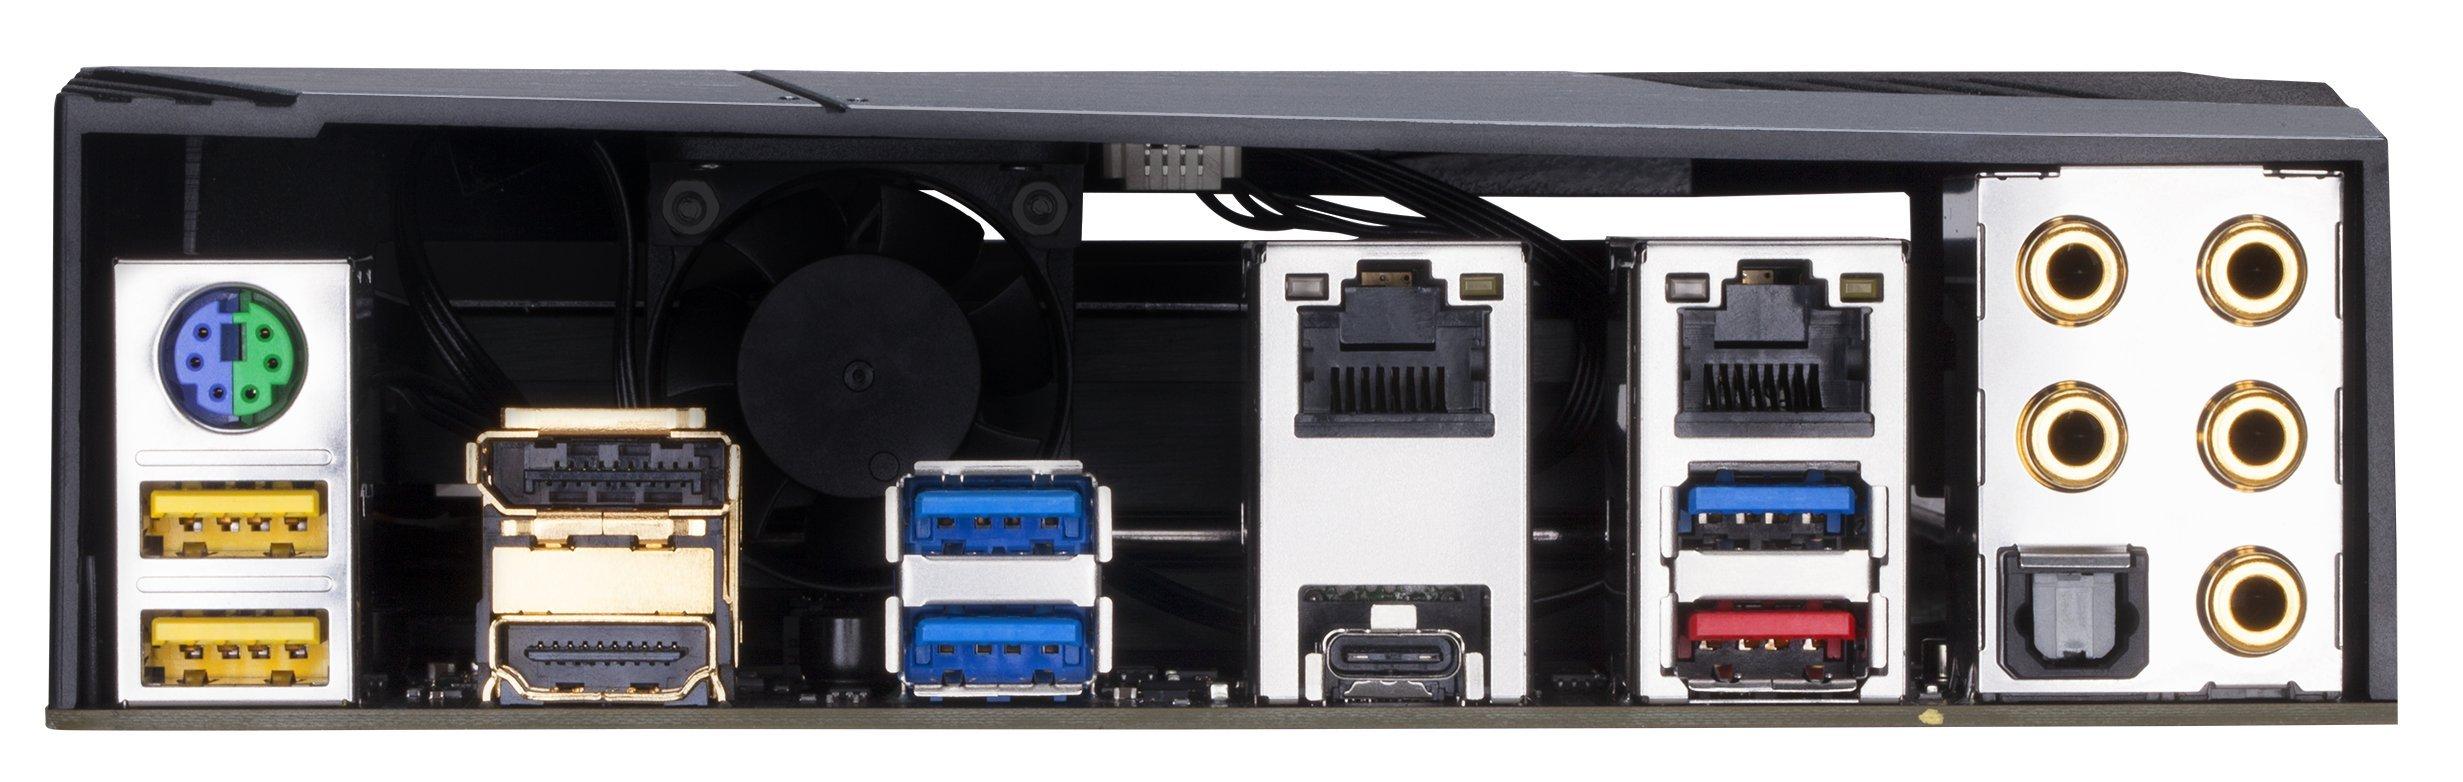 GIGABYTE Z370 AORUS Gaming 7 (Intel LGA1151/ Z370/ ATX/ 3xM.2/ M.2 Thermal Guard / Front USB 3.1 /ESS Sabre DAC /RGB Fusion/ Fan Stop /SLI/ Motherboard) by Gigabyte